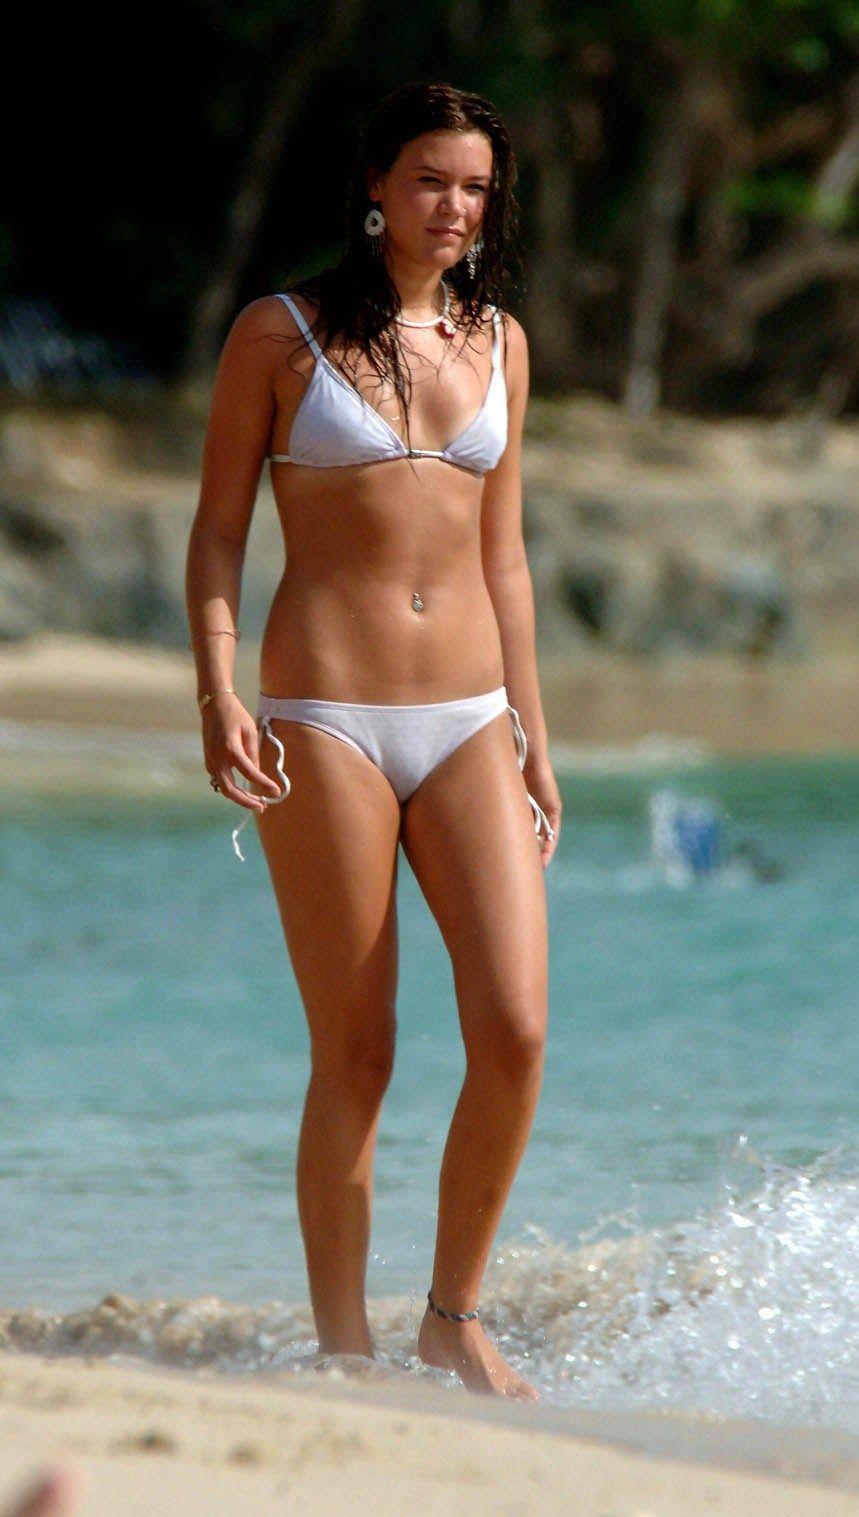 Hacked Anastasia Bondarchuk nudes (11 foto and video), Sexy, Sideboobs, Feet, butt 2006